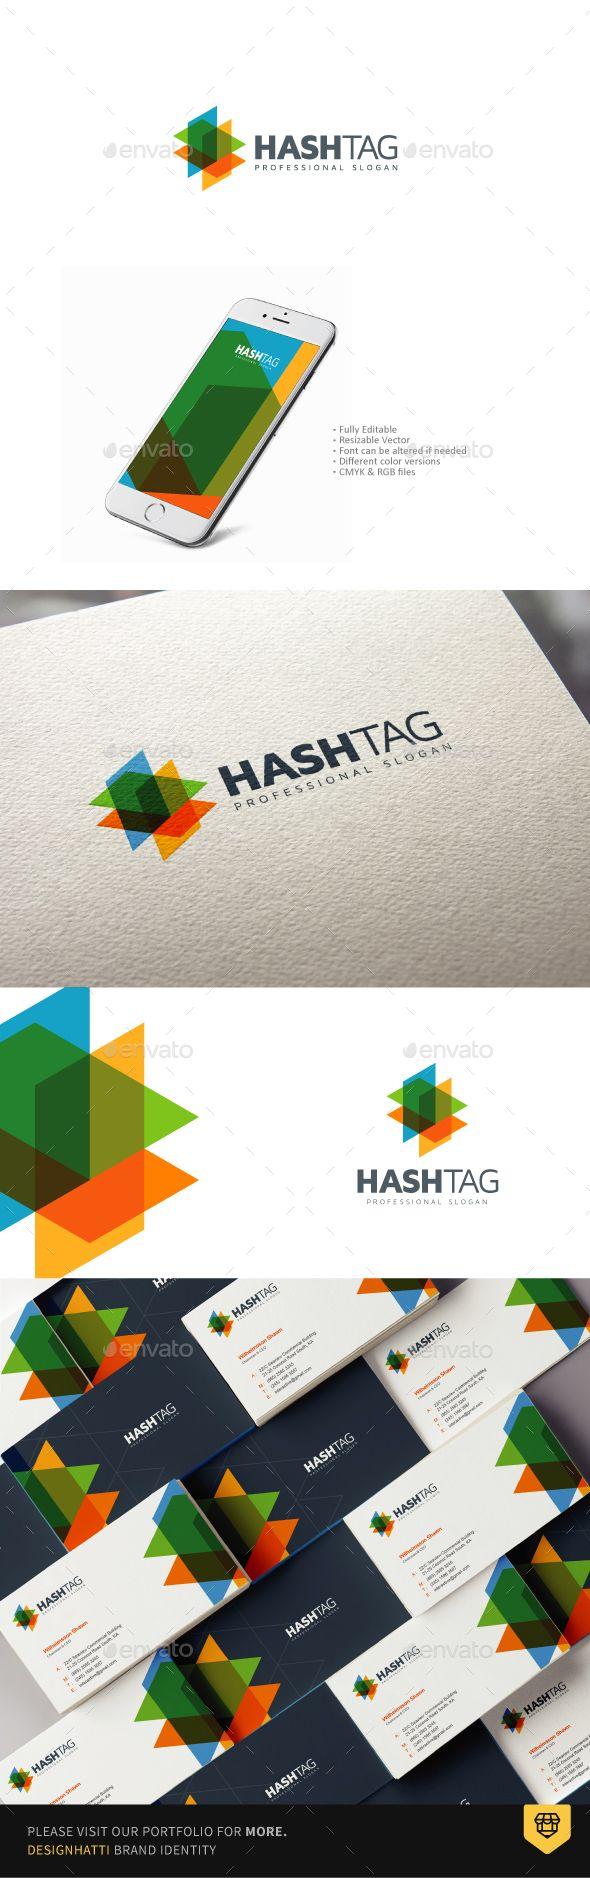 Logosmartz custom logo maker 5 0 review and download - Hashtag Logo Design